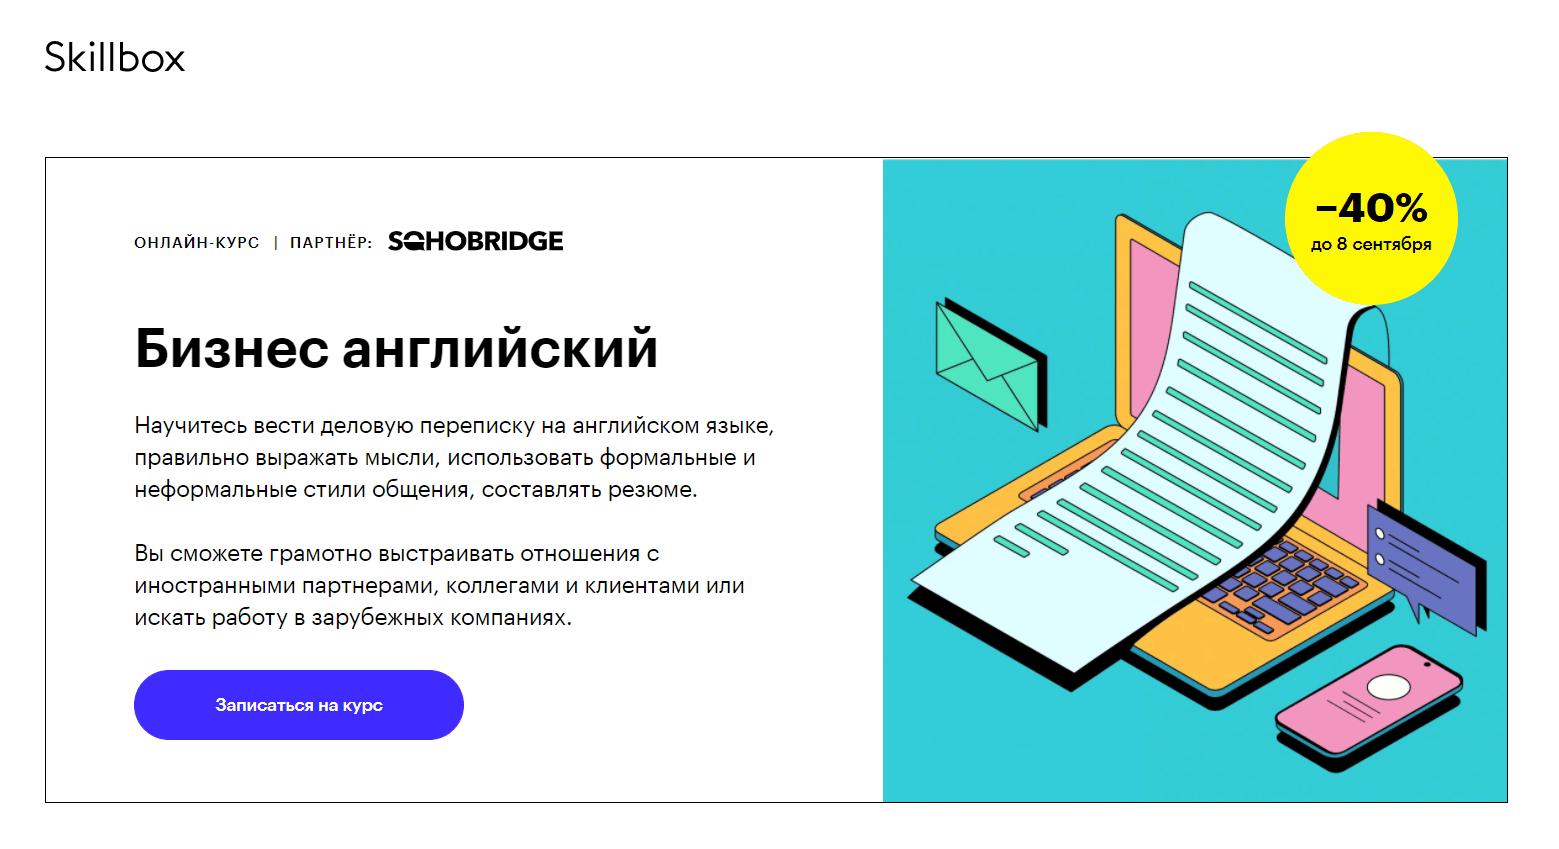 Бизнес-английский от Skillbox